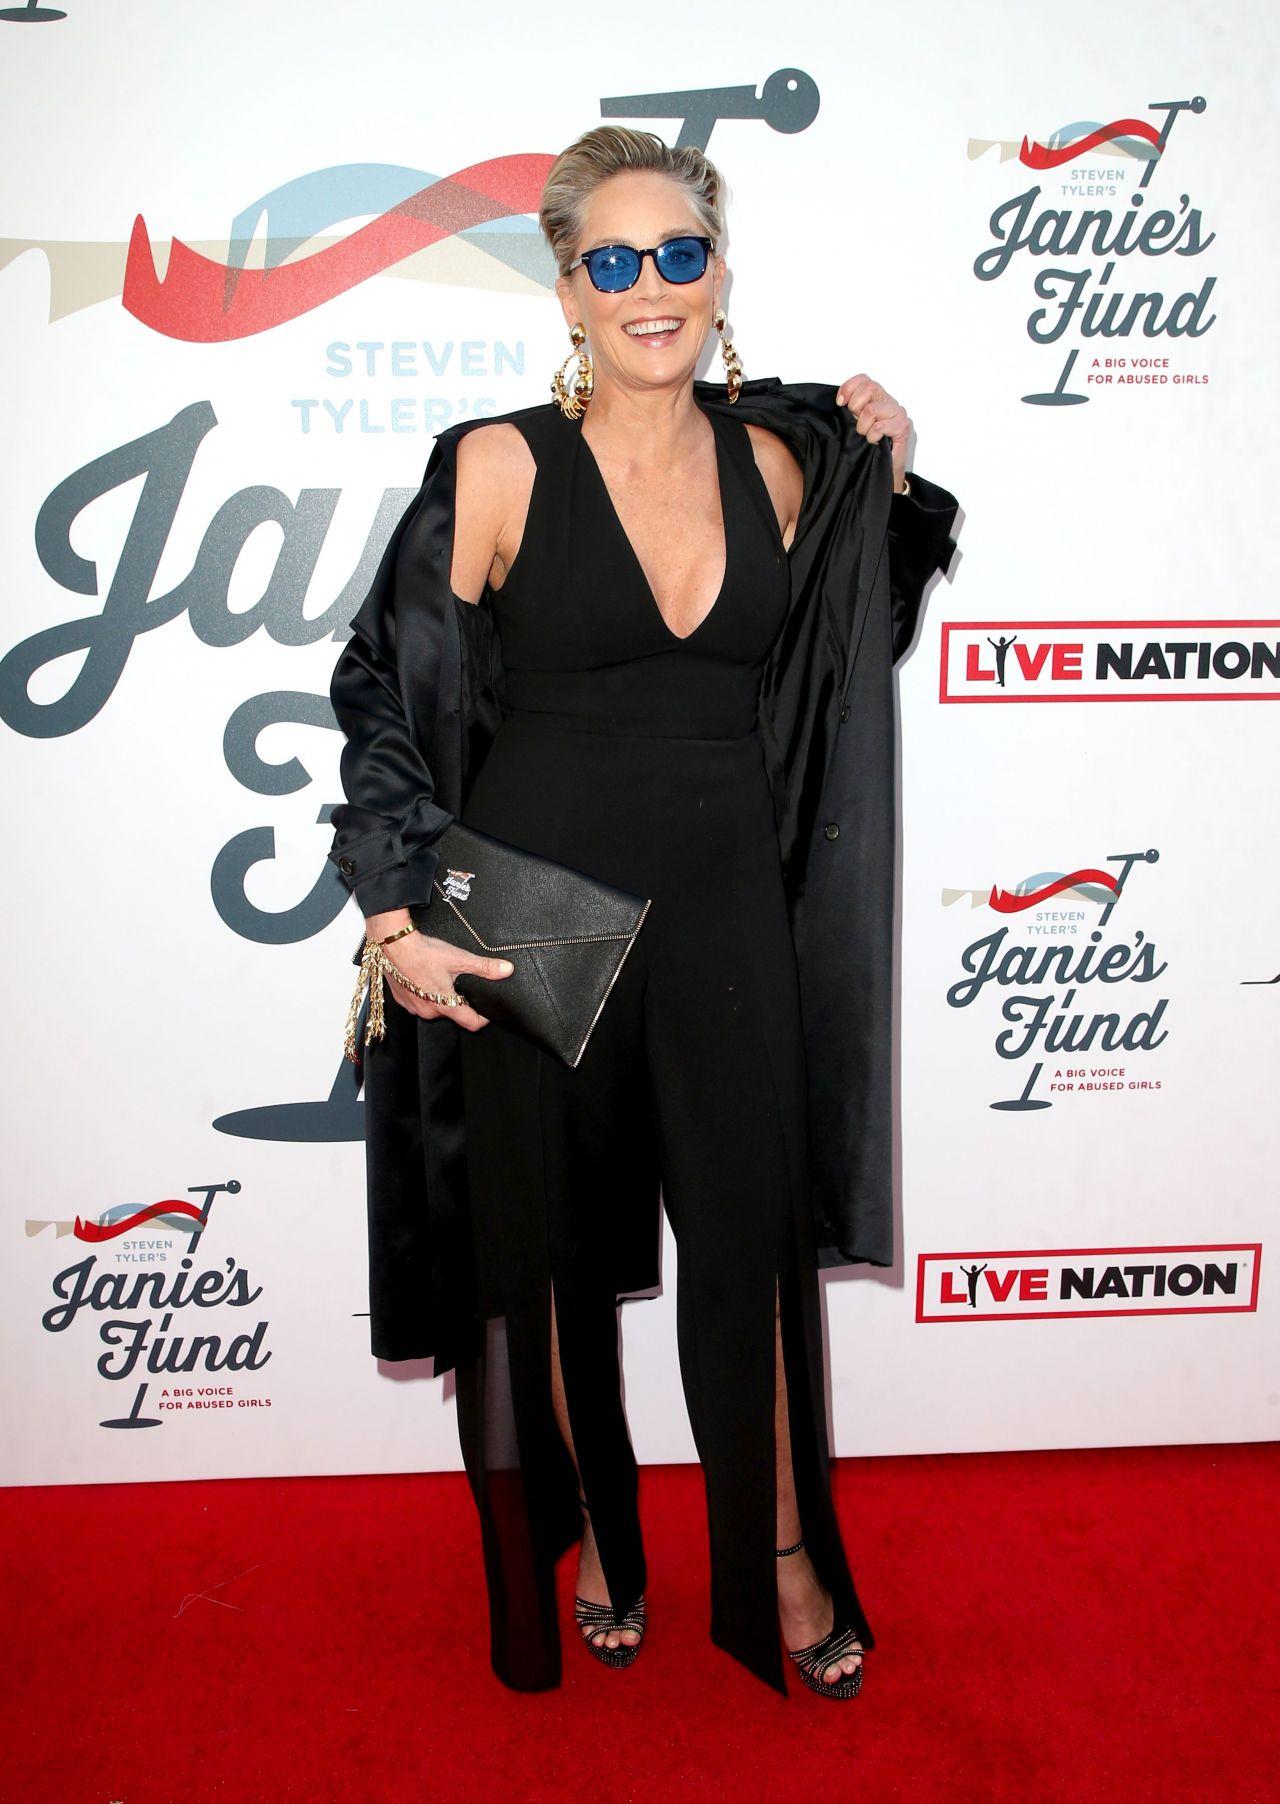 http://celebmafia.com/wp-content/uploads/2018/01/sharon-stone-inaugural-janie-s-fund-gala-grammy-viewing-party-in-la-3.jpg